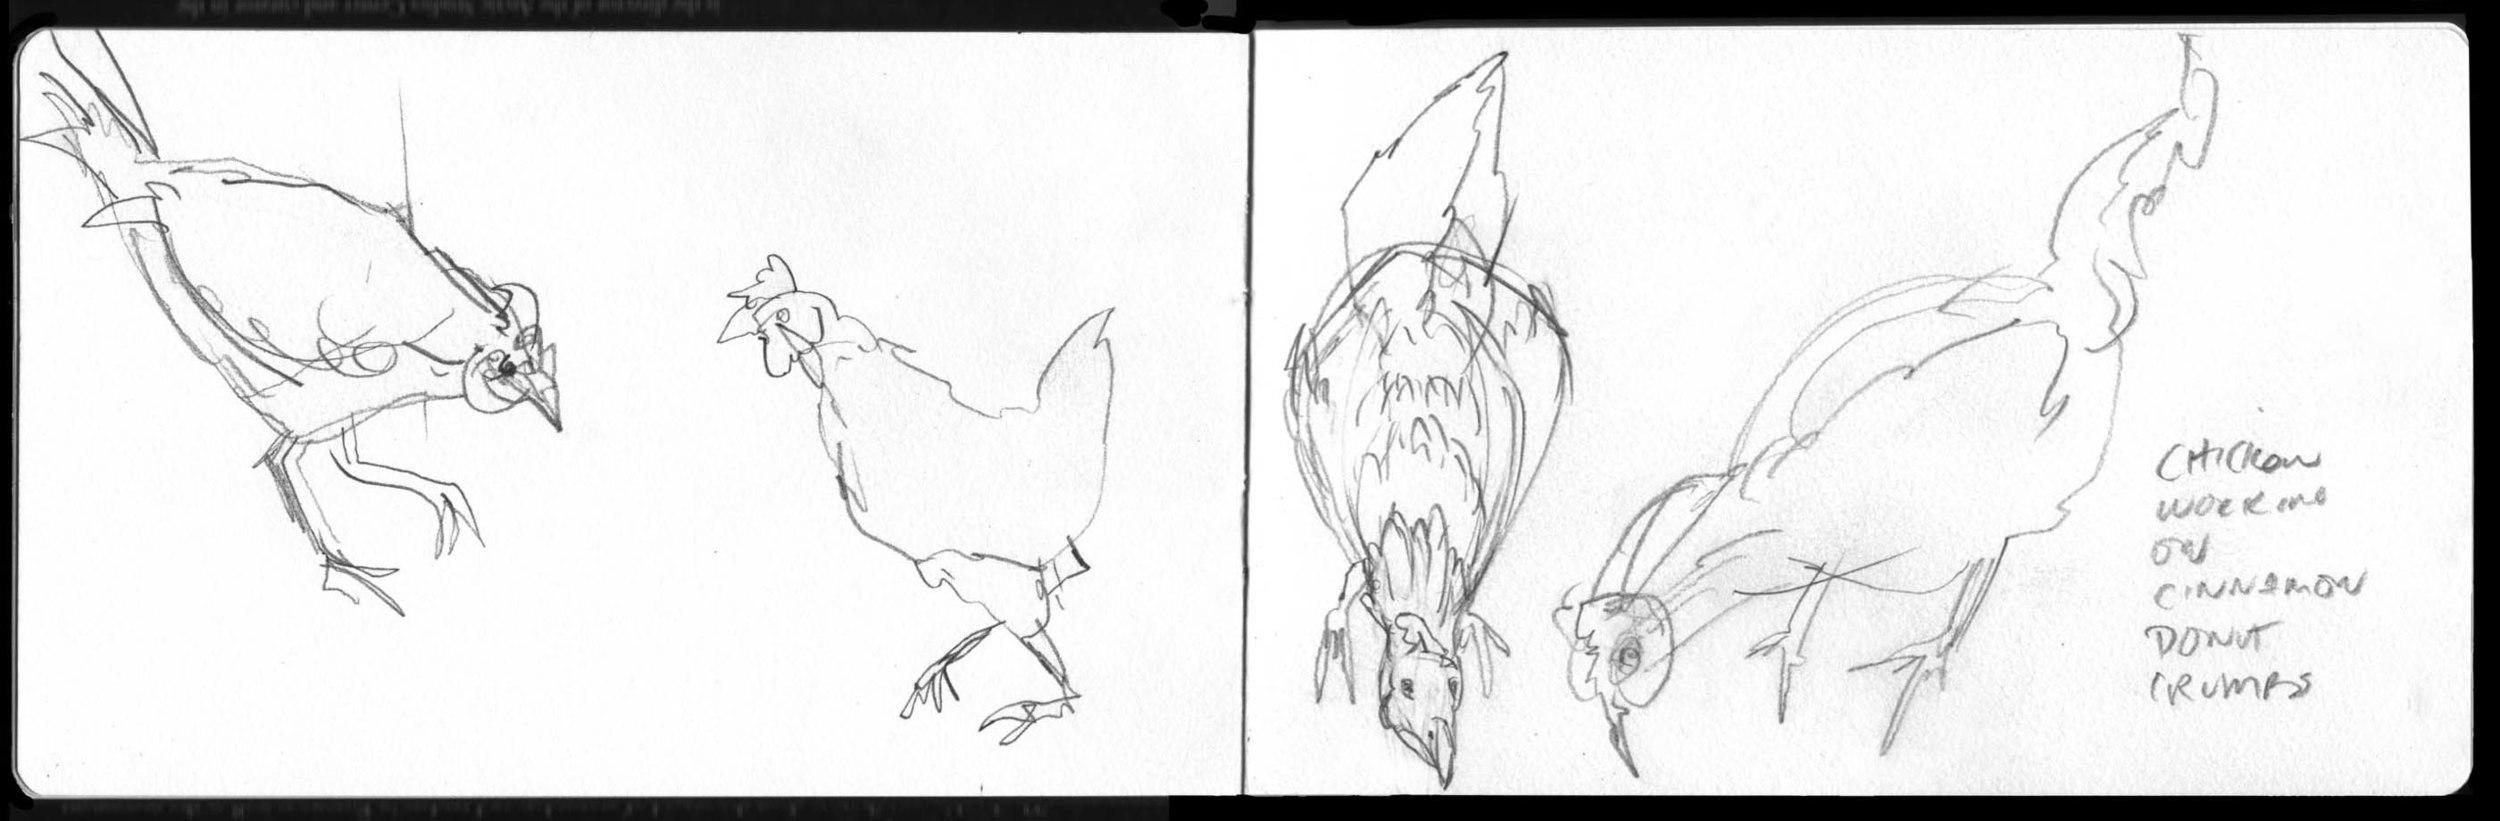 Fiedler FarmSchl Chickens.jpg